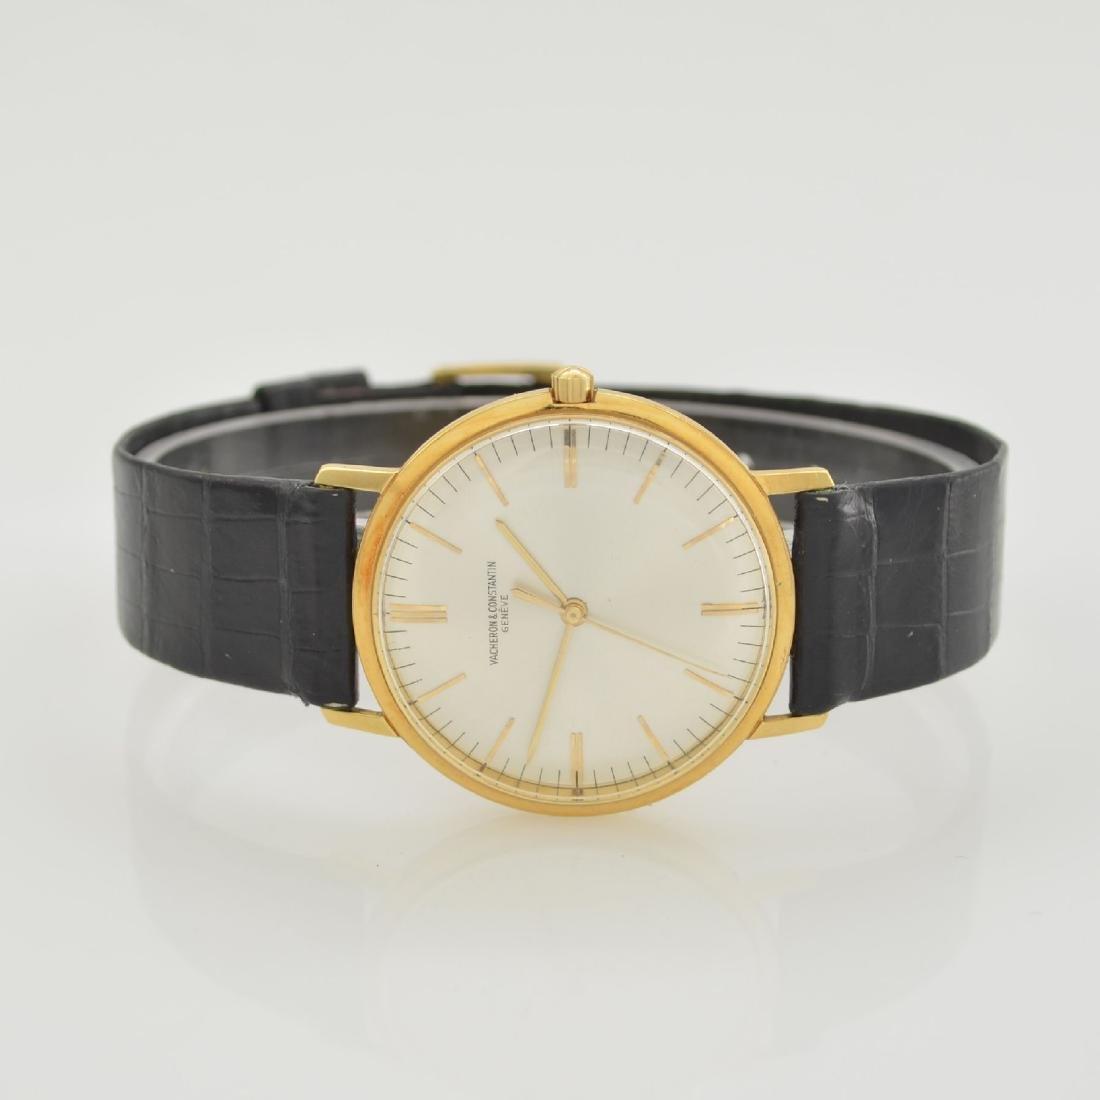 VACHERON & CONSTANTIN fine 18k gold gents wristwatch